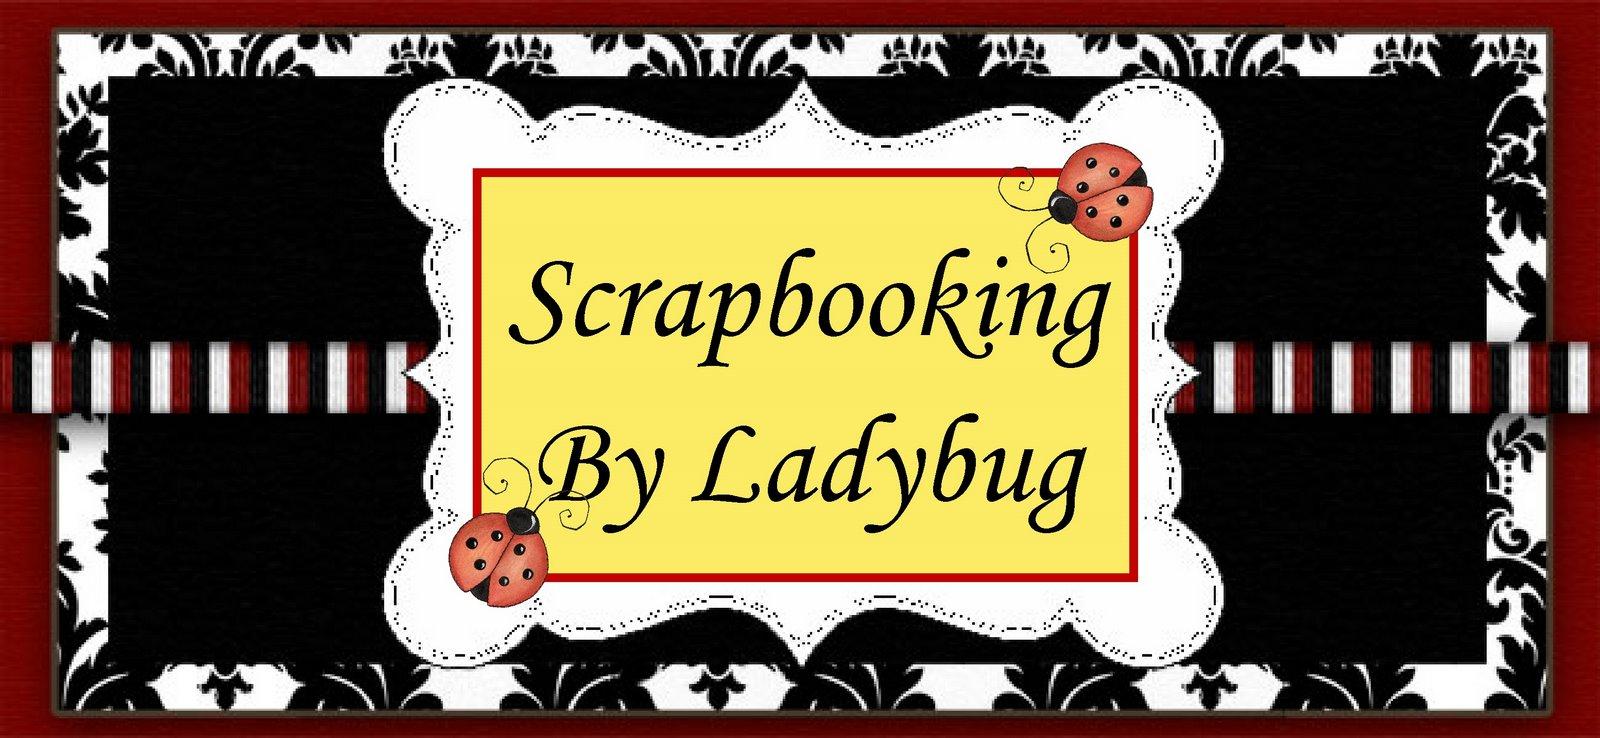 Scrapbooking By Ladybug